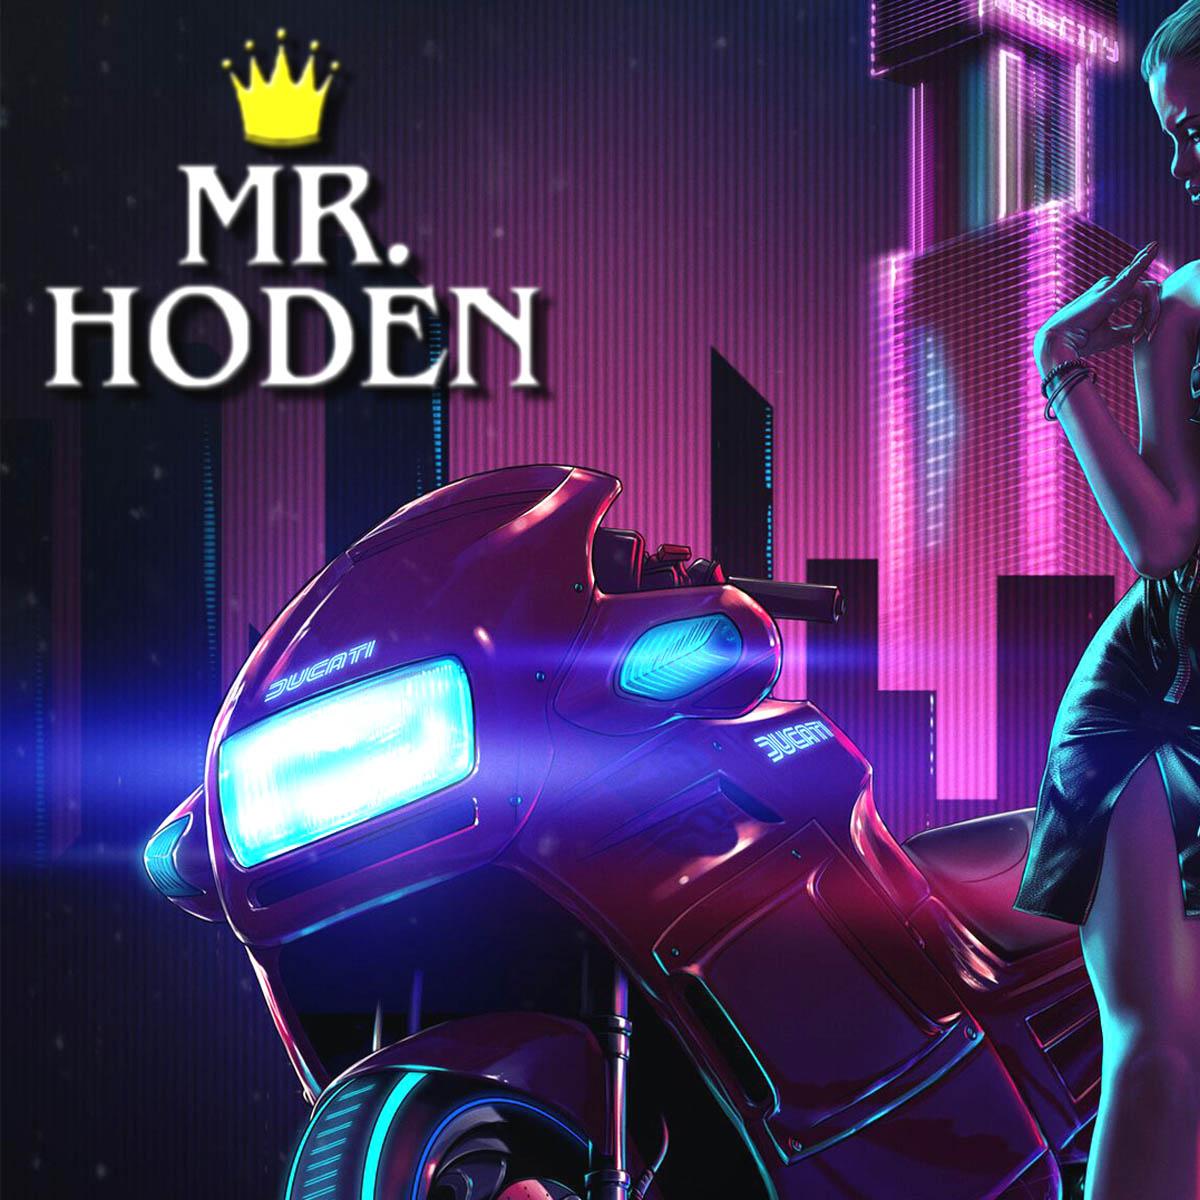 Upcoming: Mr. Hoden - NEUER FREE BEAT!!